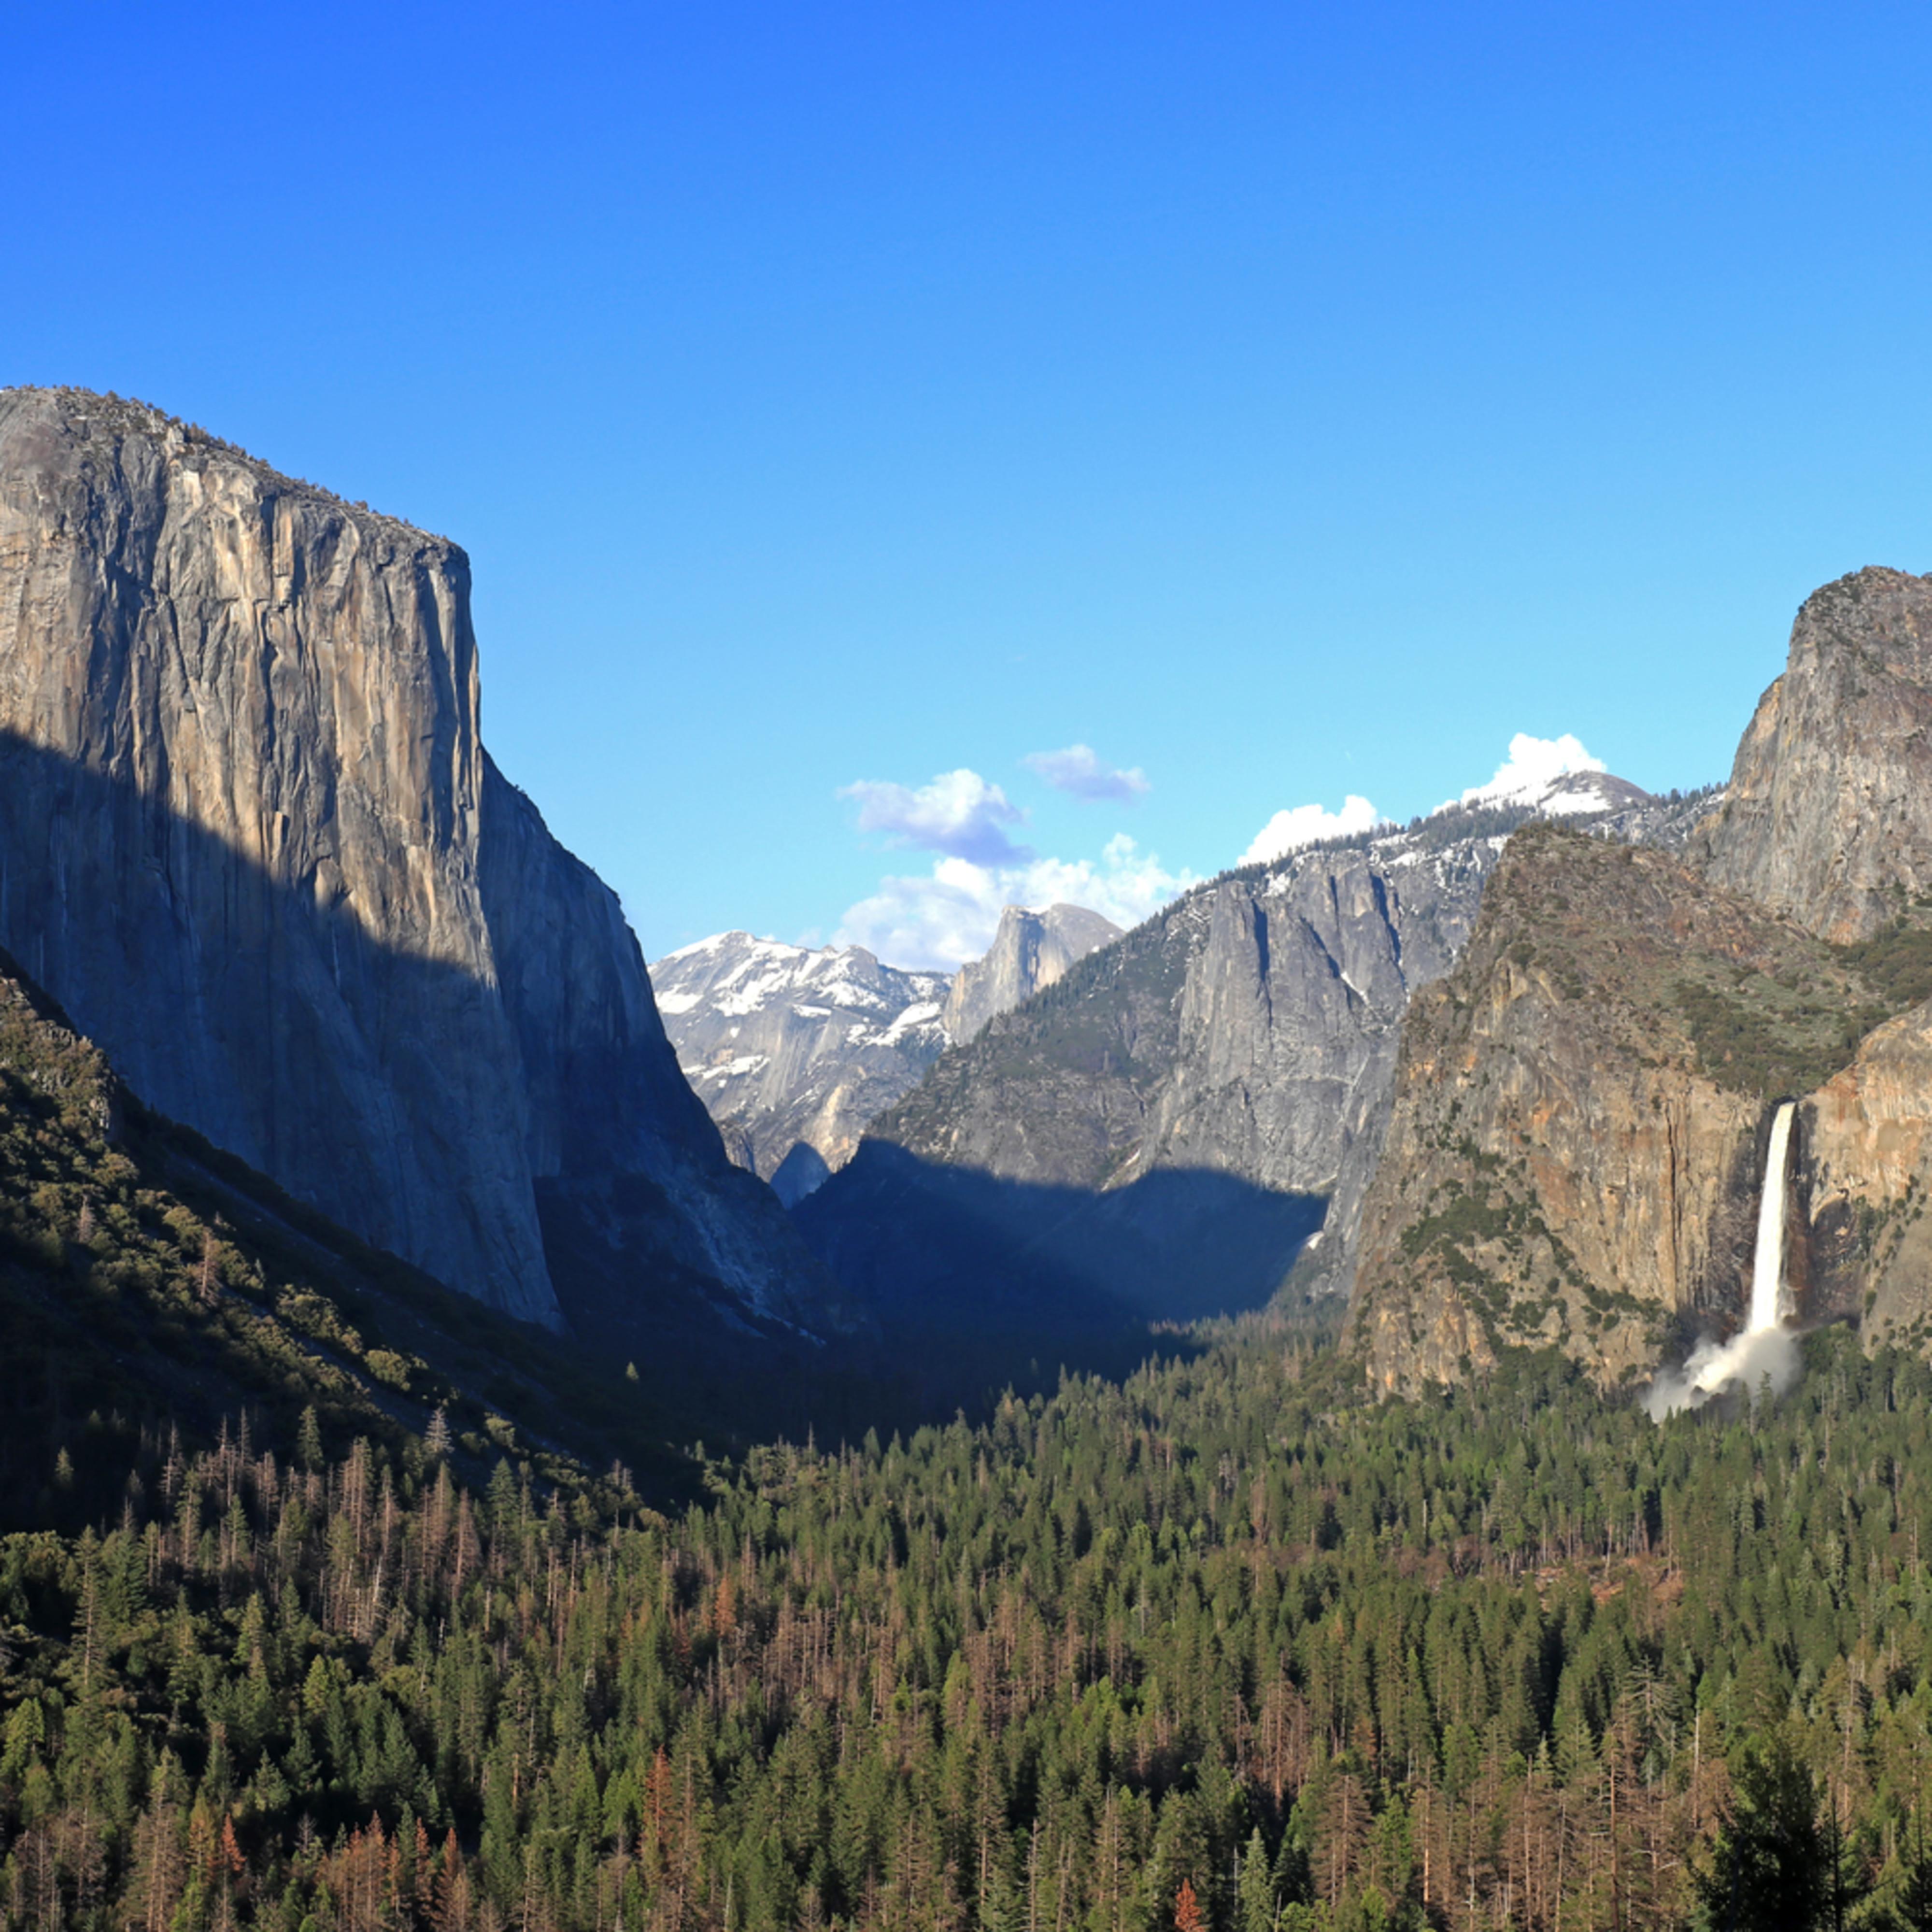 Yosemite tunnel view lqvqdz